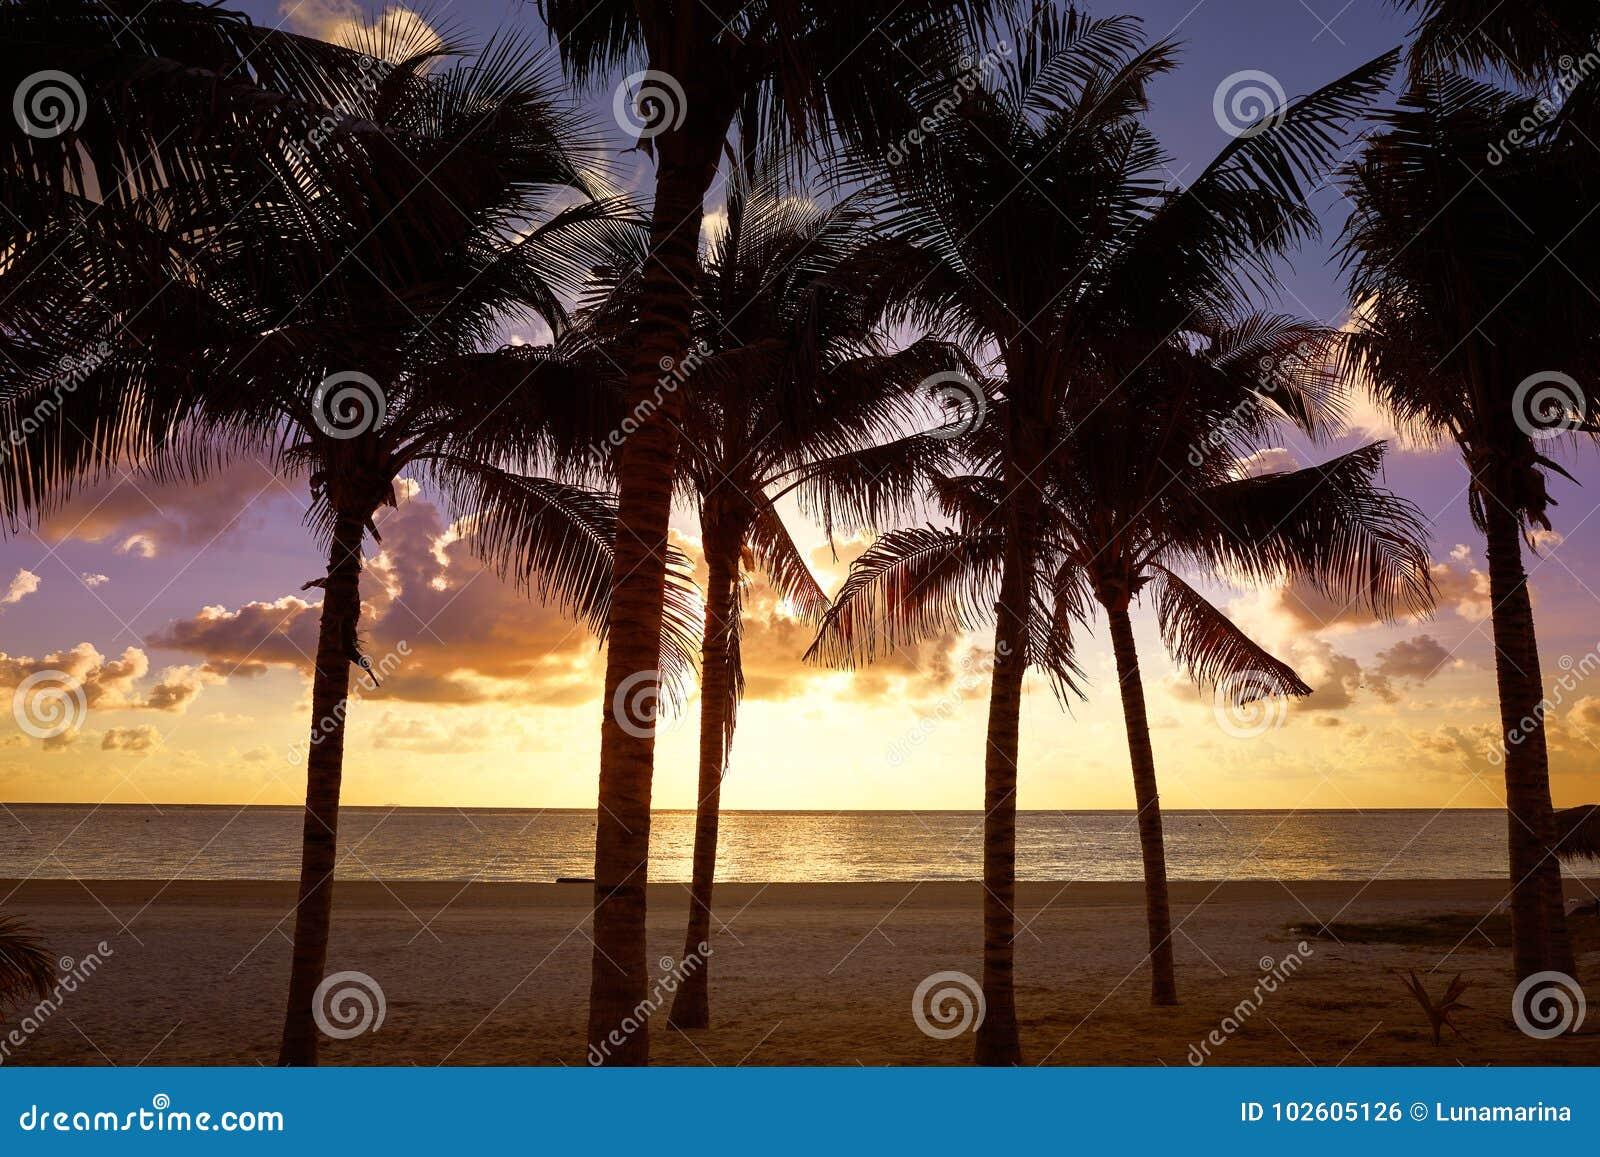 Riviera Maya sunrise beach in Mexico